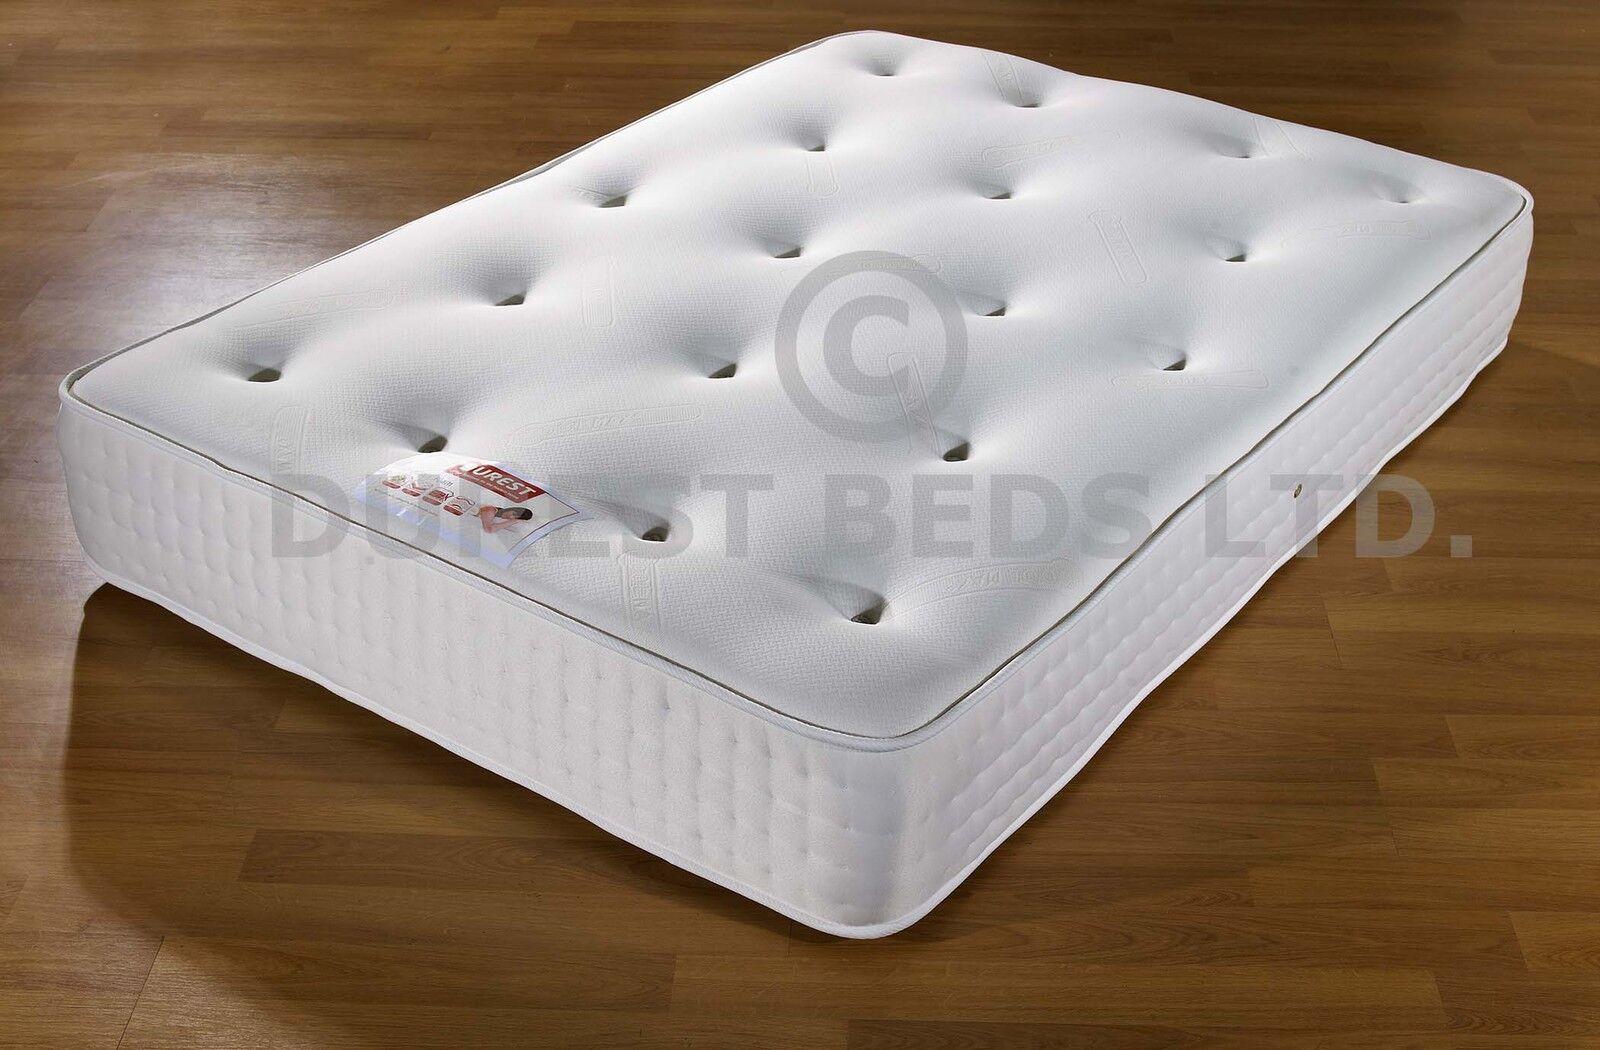 12 memory foam semi orthopaedic mattress double 4ft6 5ft. Black Bedroom Furniture Sets. Home Design Ideas